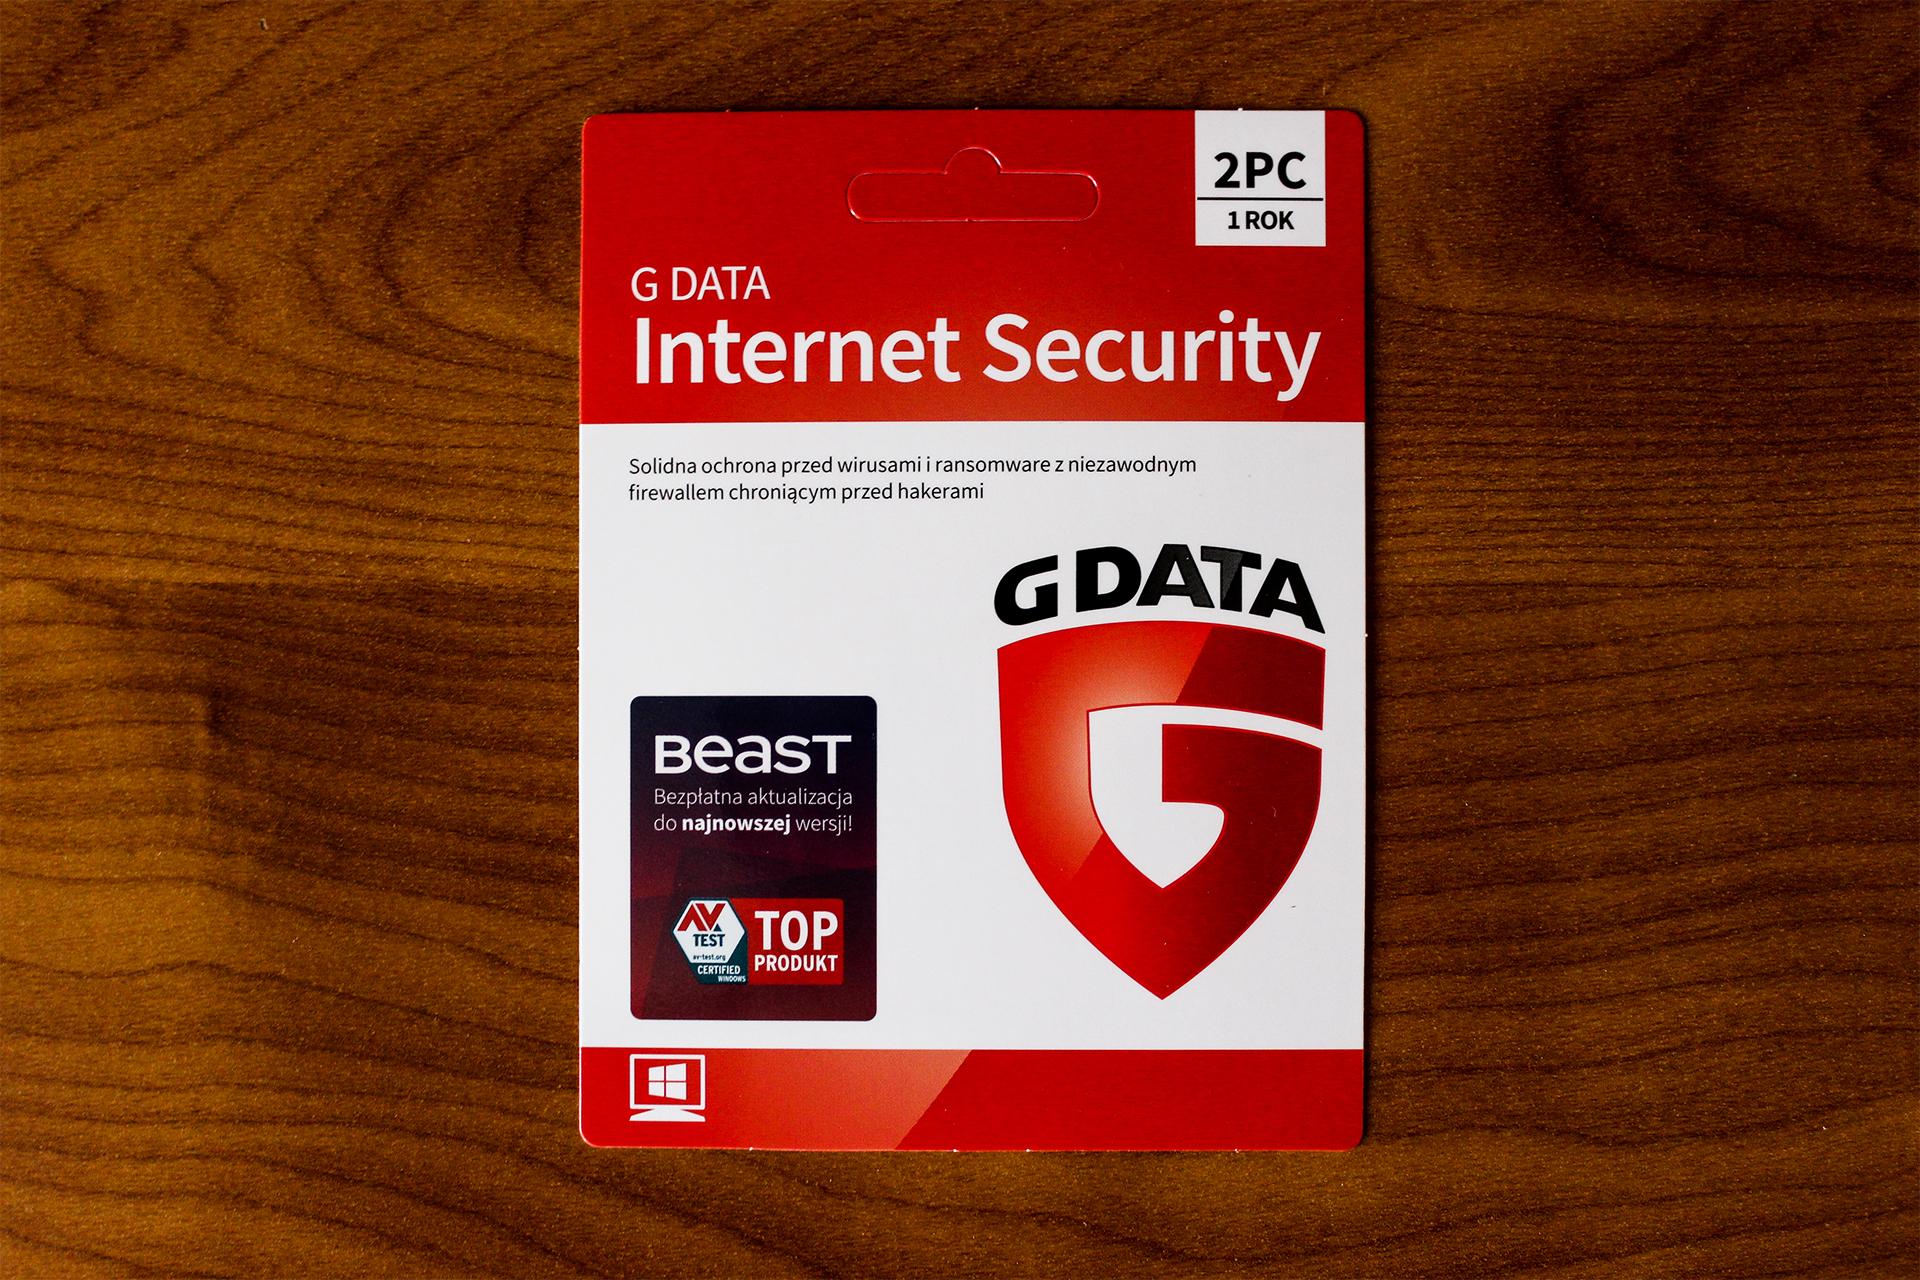 G DATA INTERNET SECURITY 2PC 1 ROK